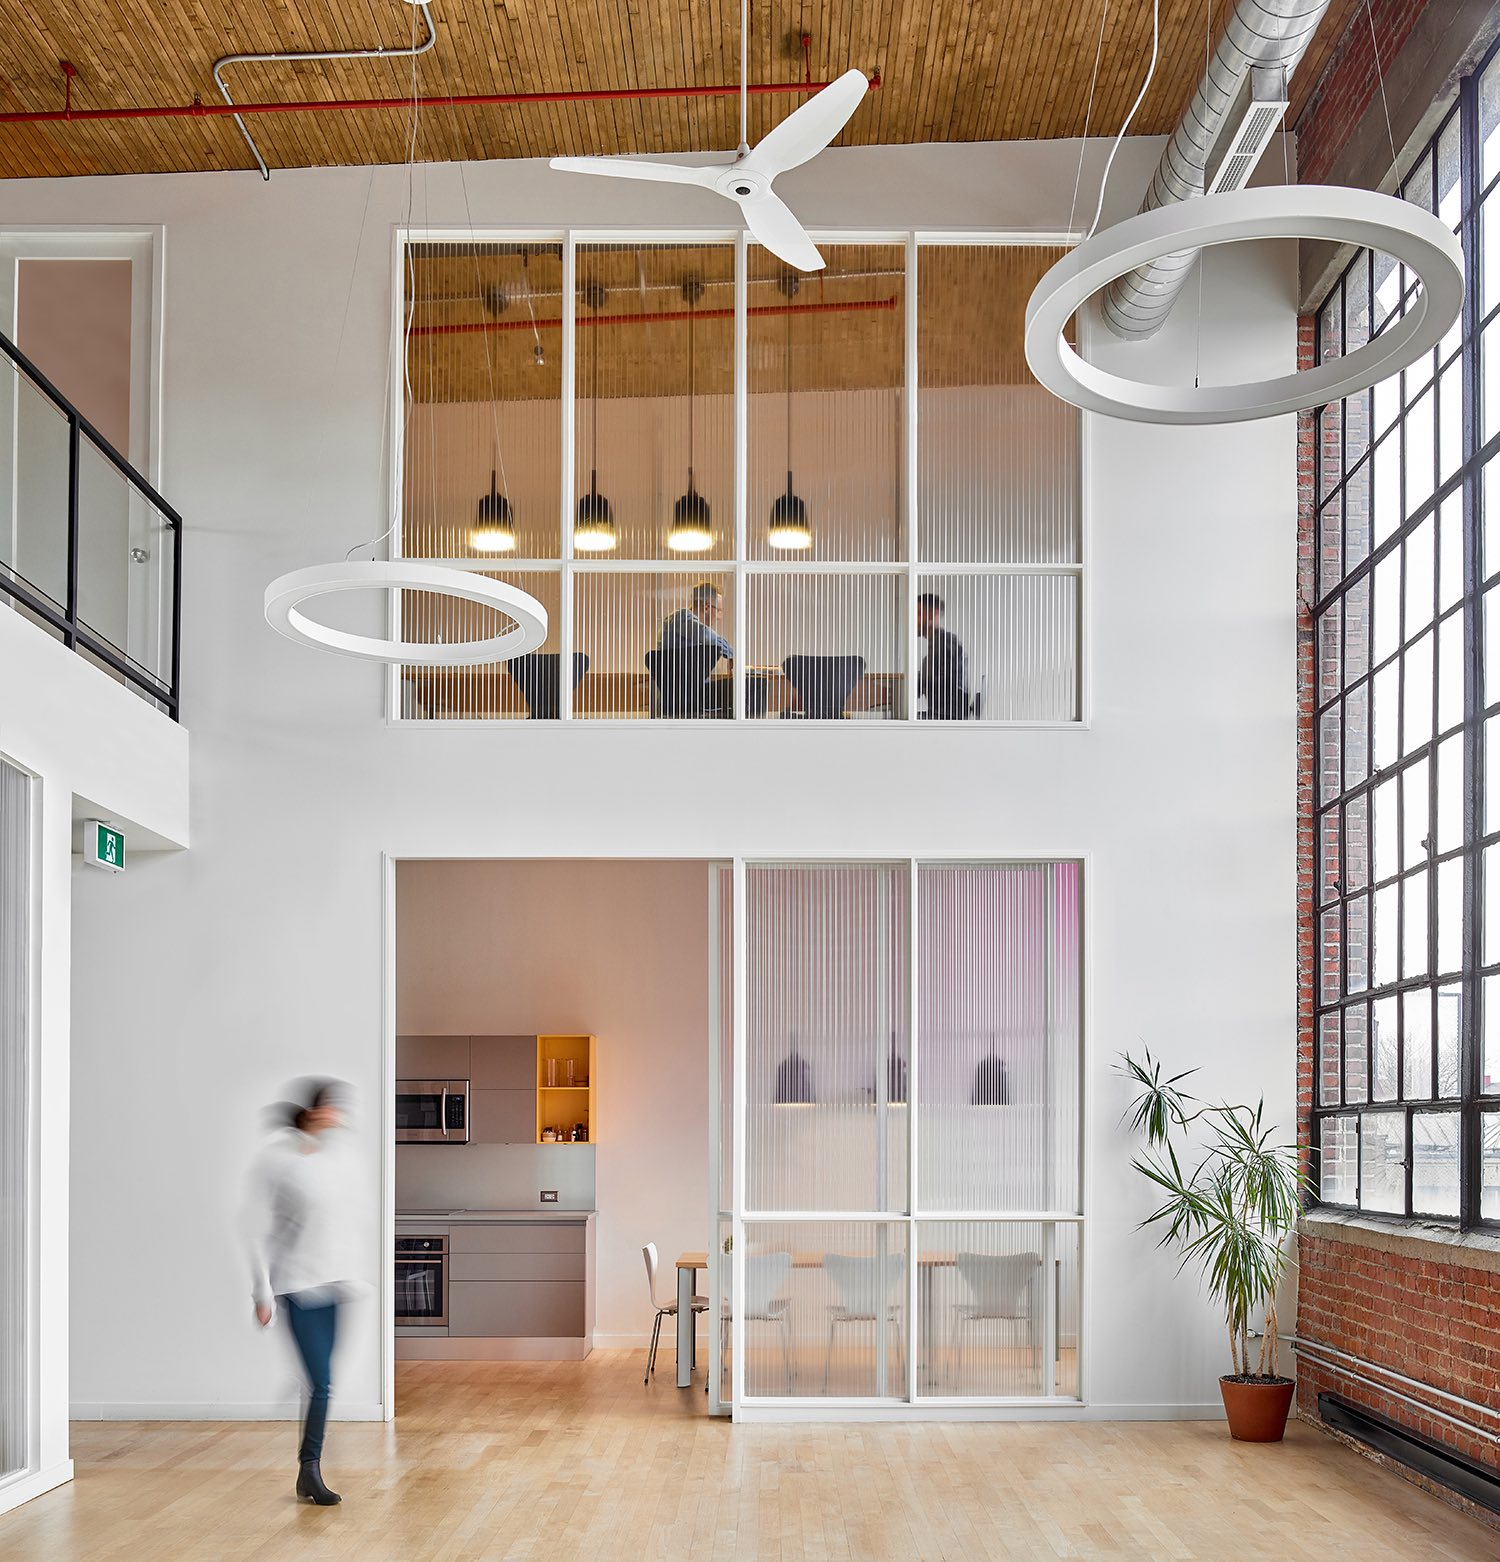 A Tour Of Azure Publishing's New Toronto Headquarters